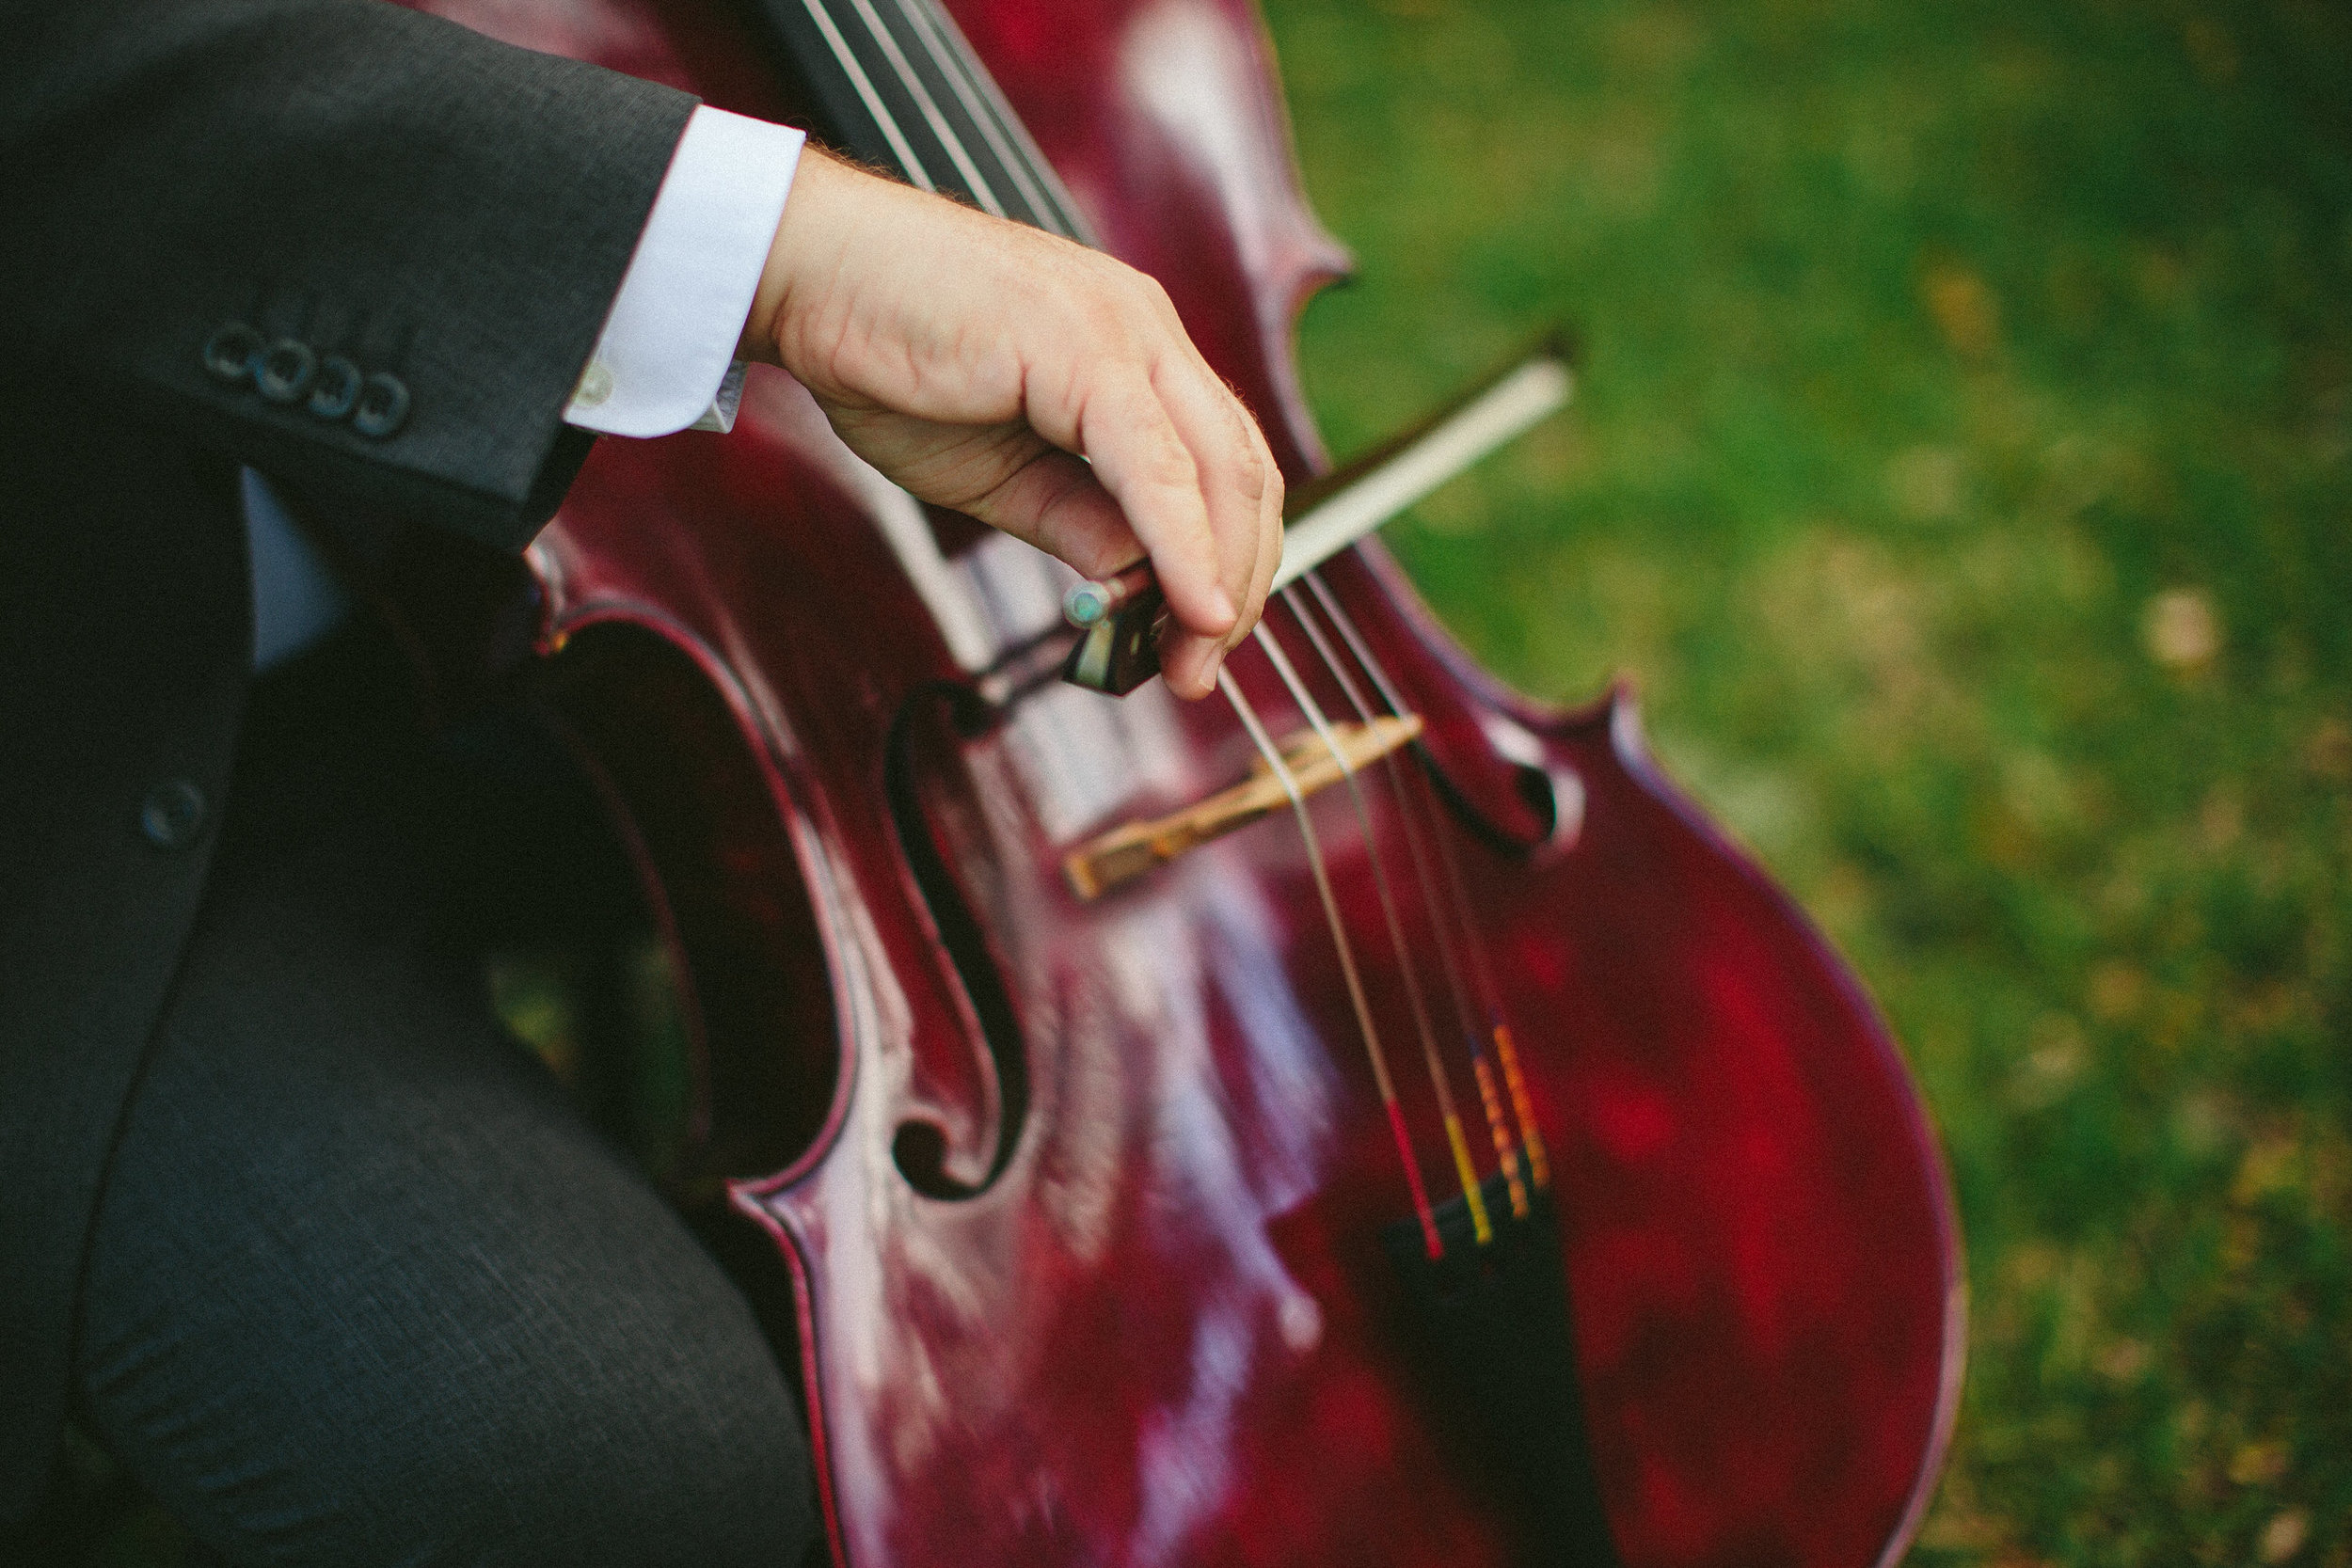 violin-music-instrument-wedding-tiny-house-photo.jpg